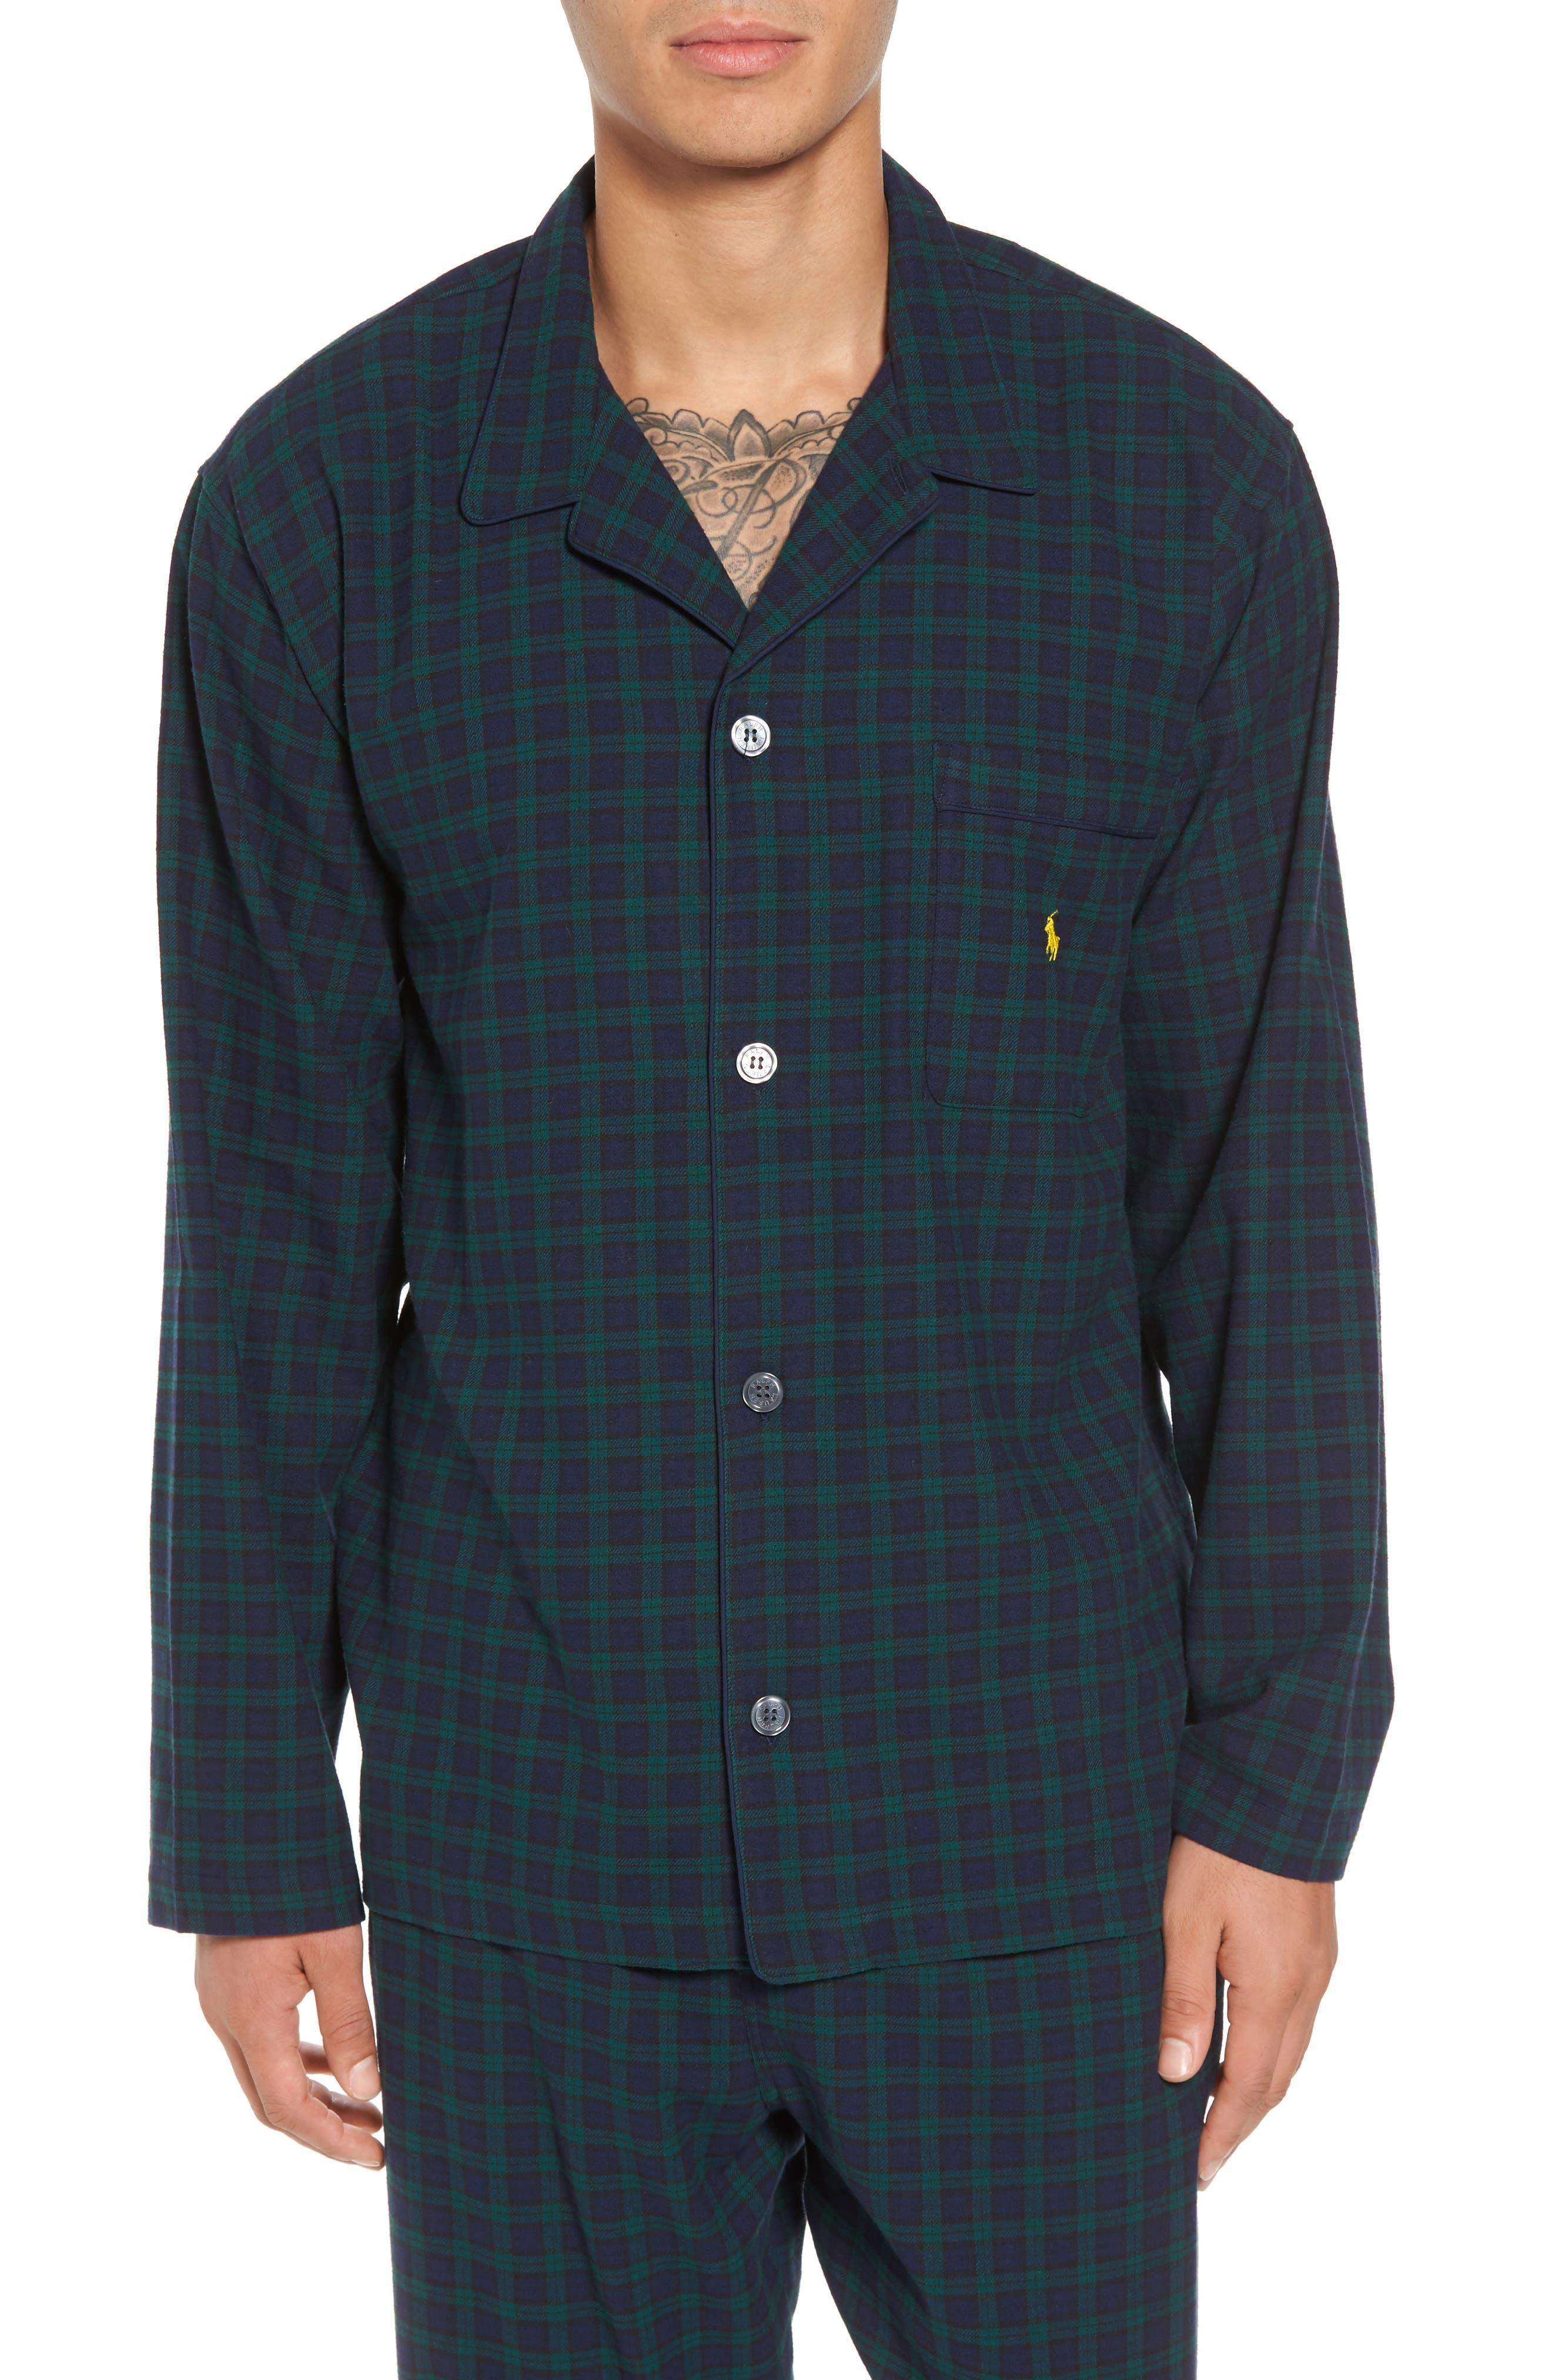 Main Image - Polo Ralph Lauren Flannel Pajama Shirt